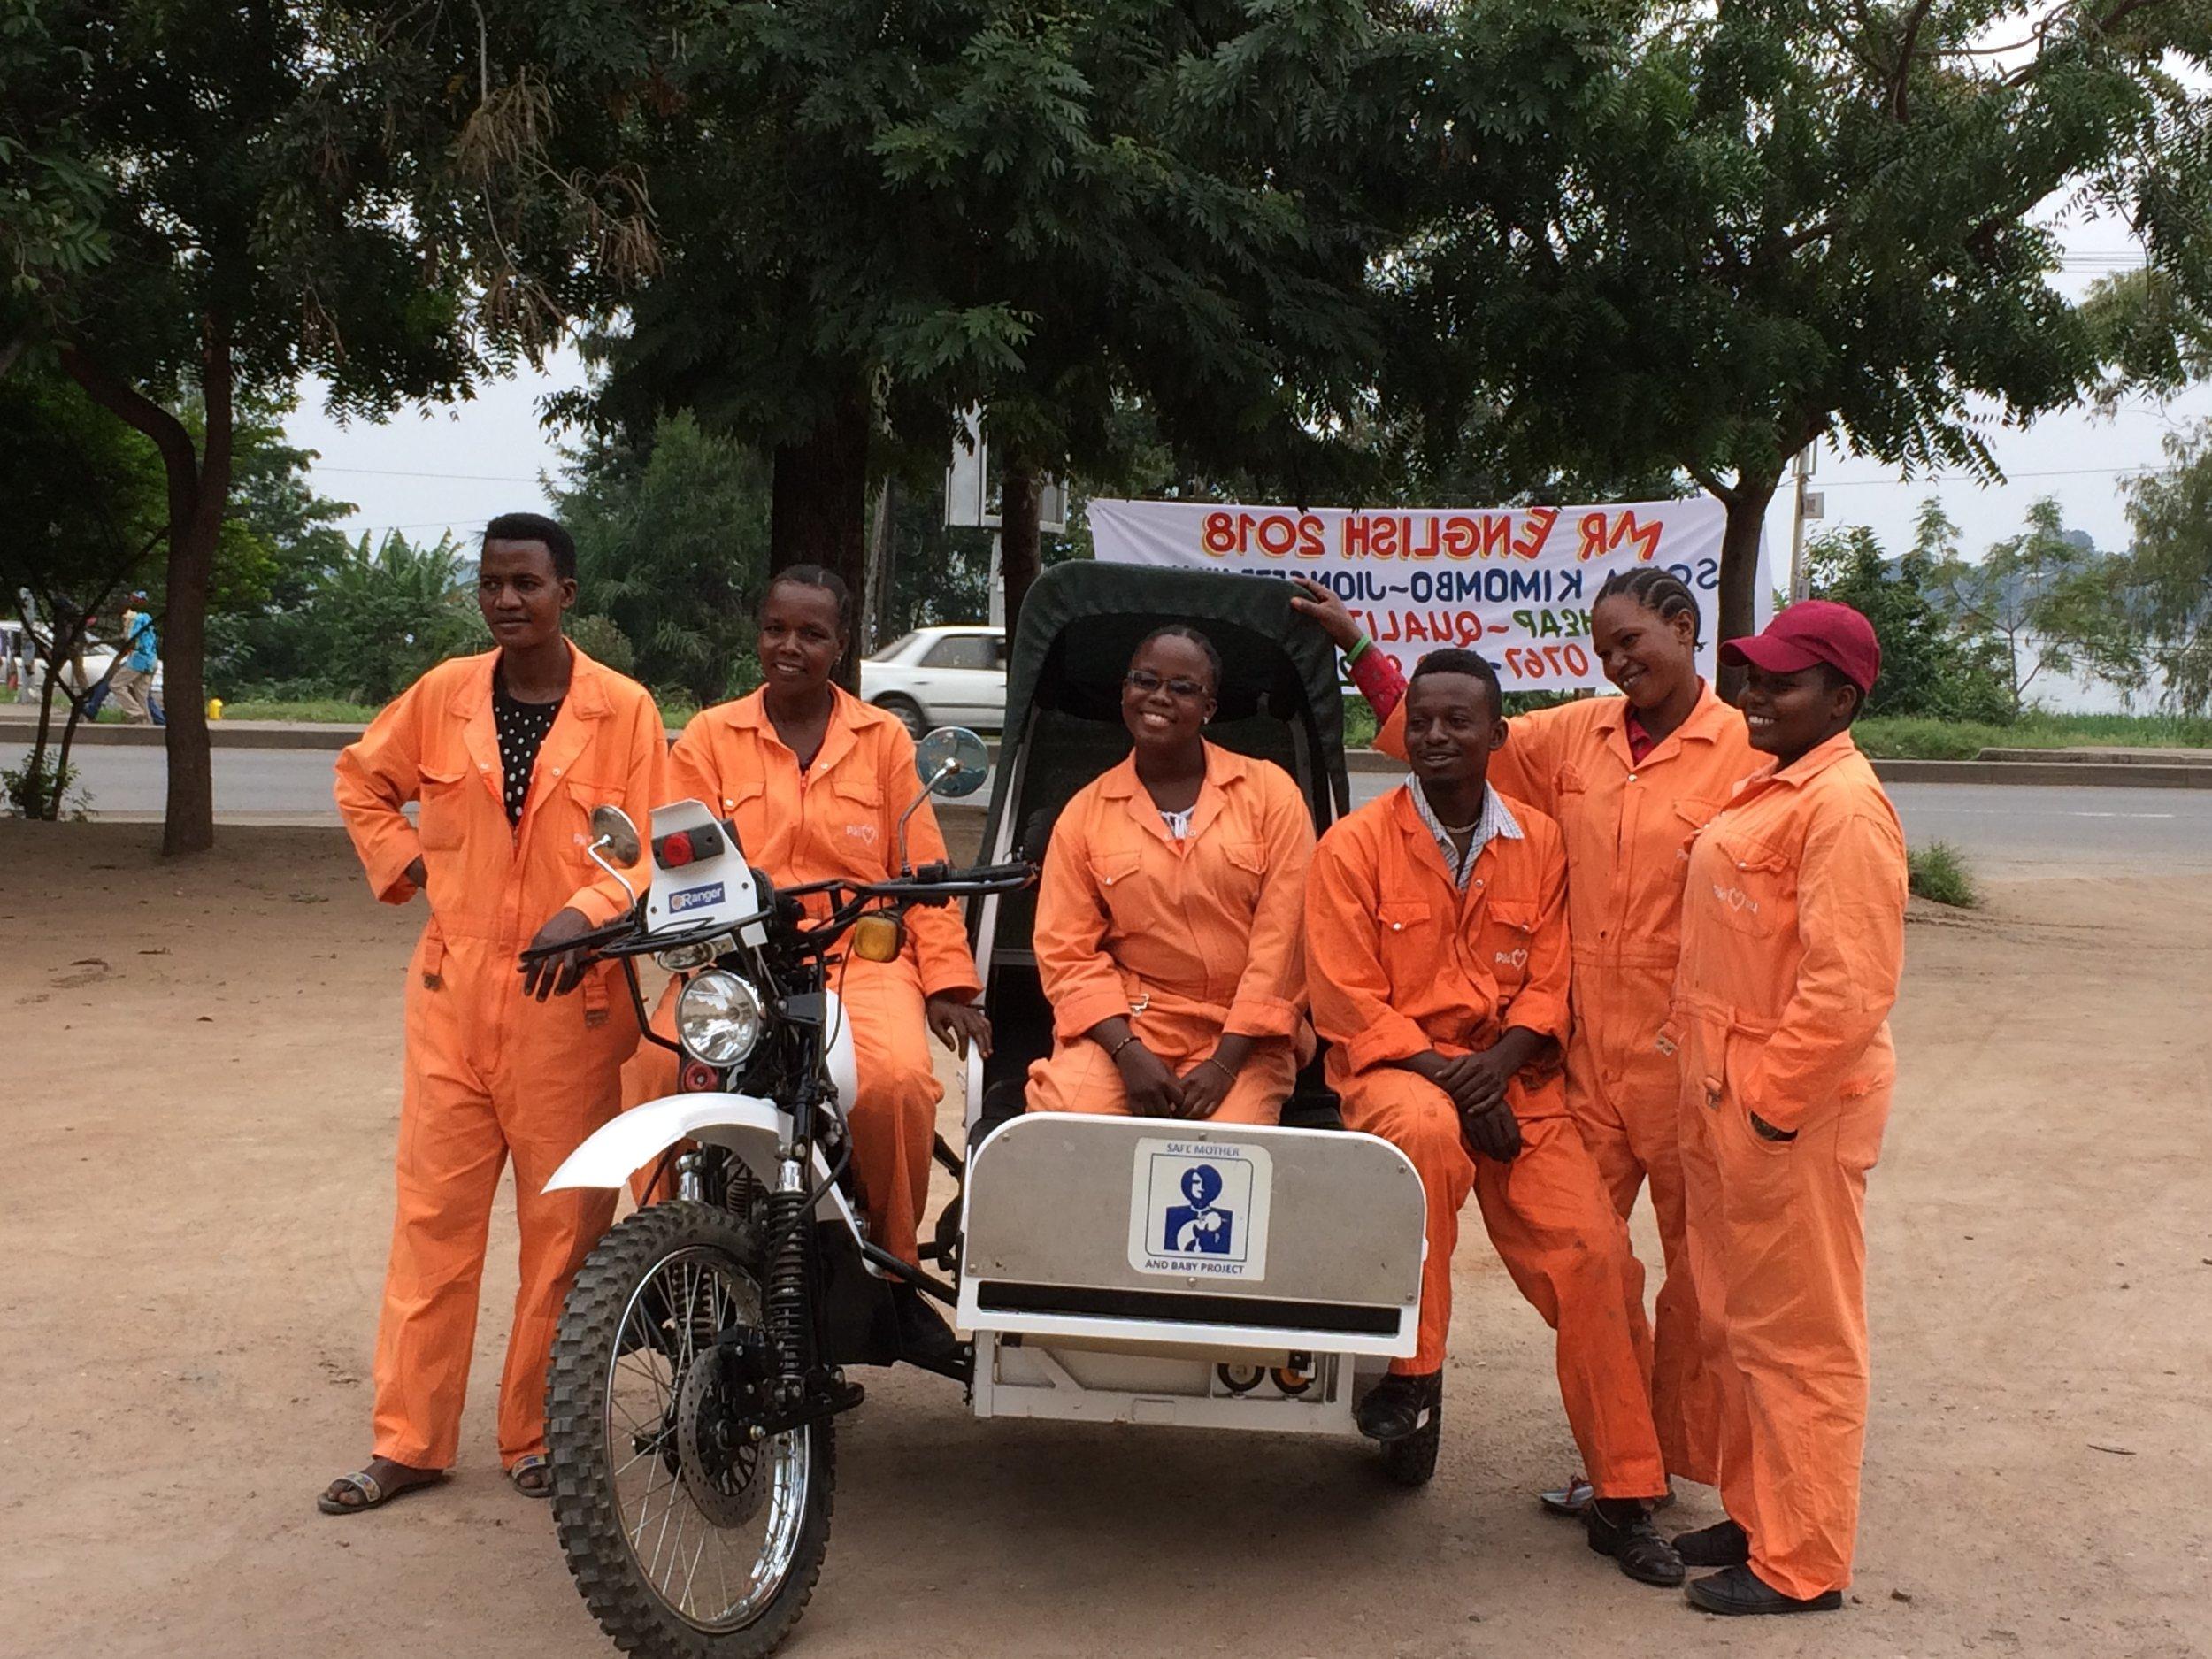 Image: Claire Elsdon | Pikilily | Women's motorcycle ambulance group